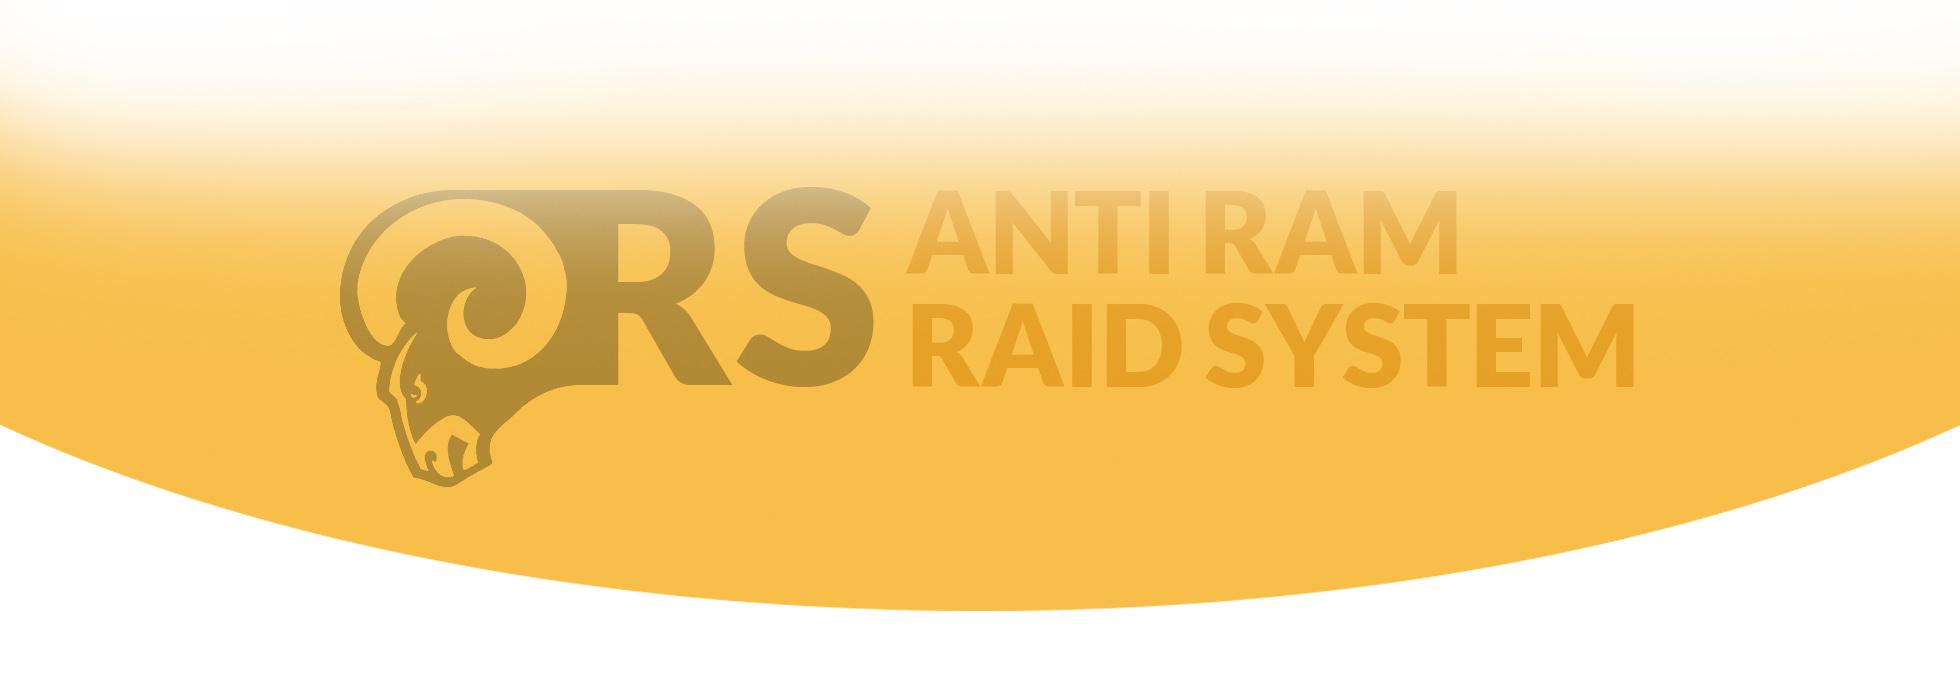 Anti Ram Raid System